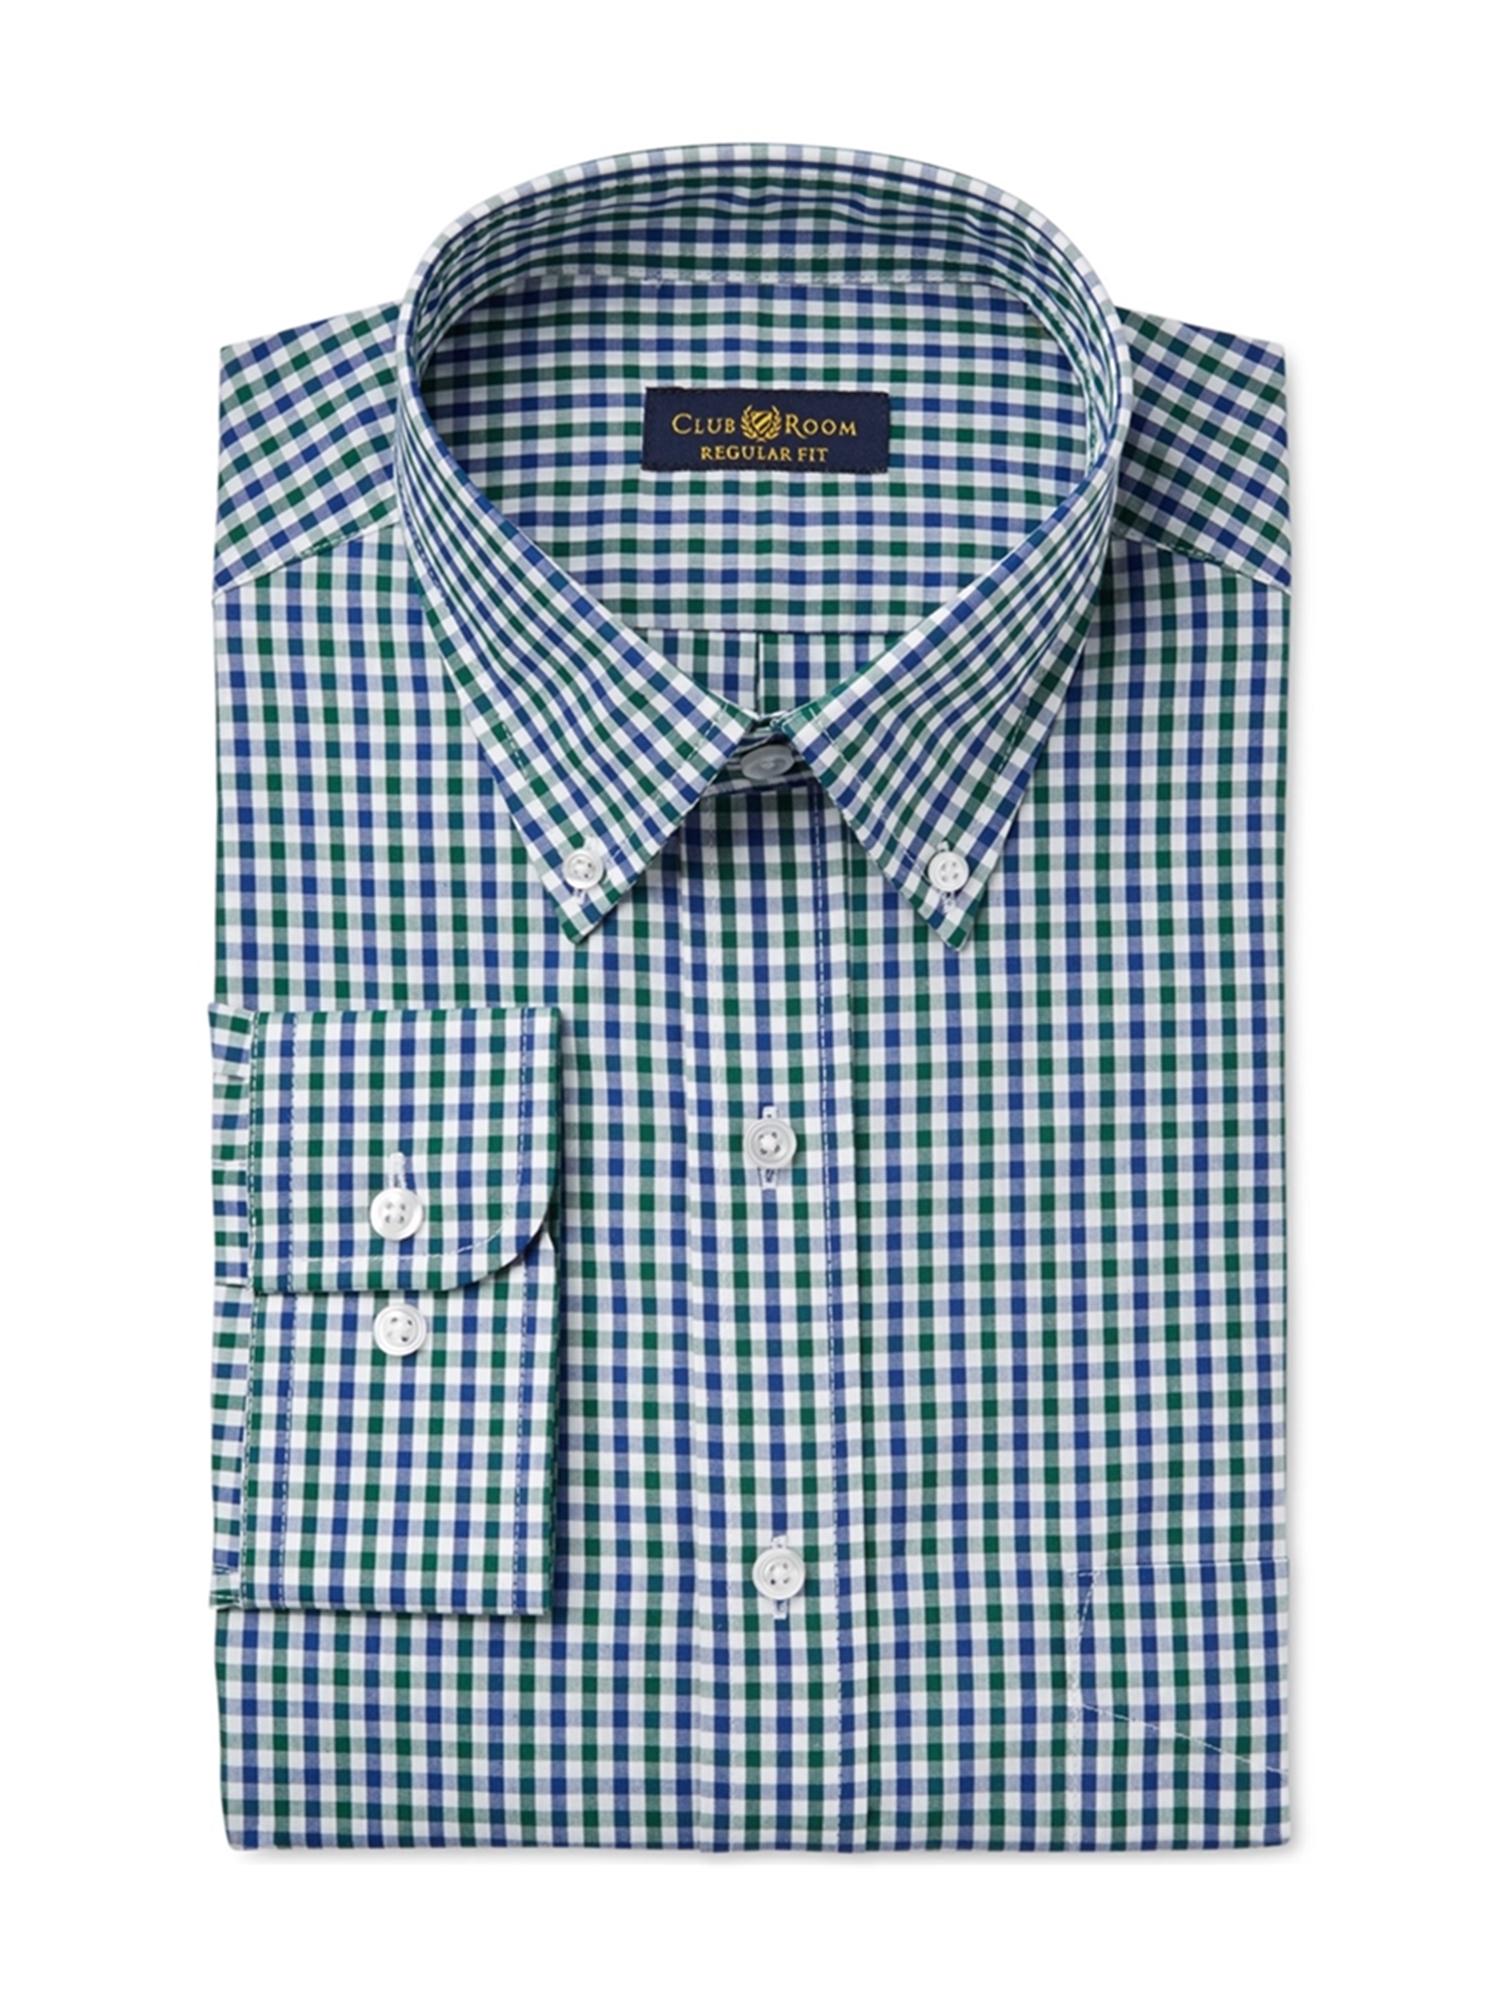 Club Room Mens Gingham Button Up Dress Shirt